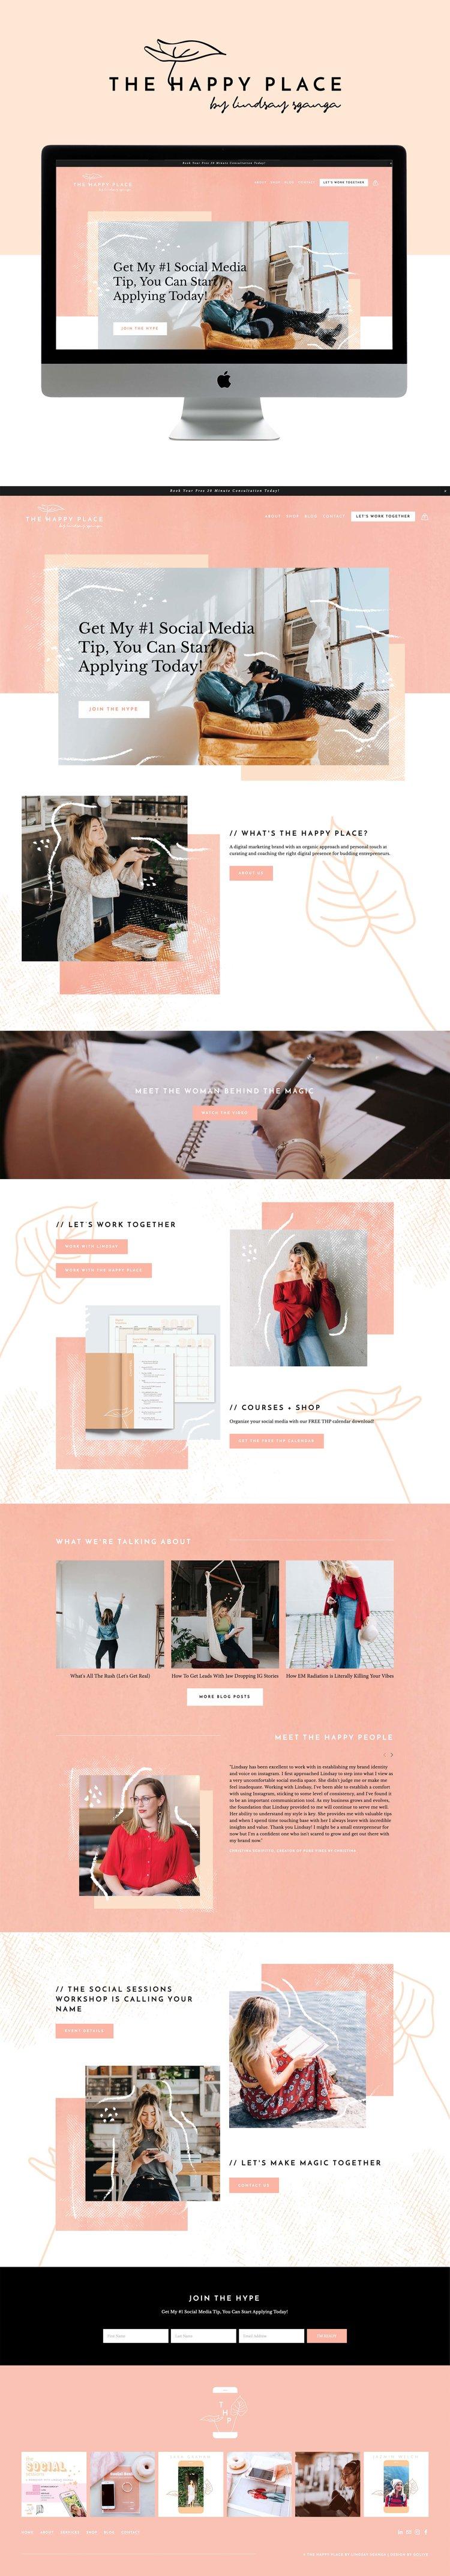 Bright,+Modern,+Fun+Squarespace+Website+Design+For+Digital+Marketing+Agency+By+GoLive.jpg